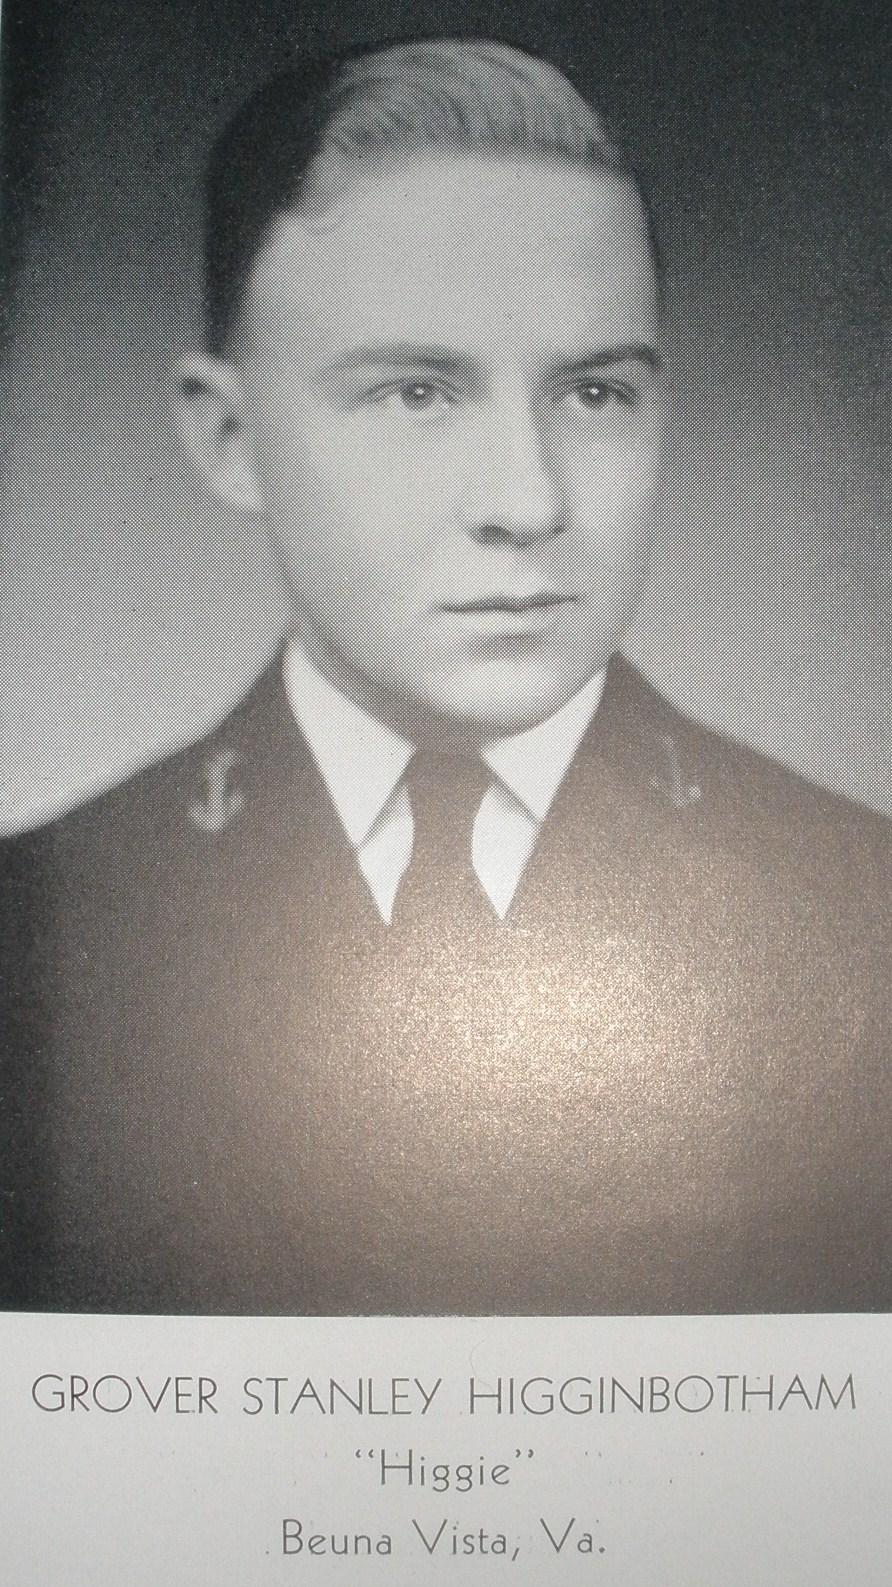 CPT Grover Stanley Higginbotham